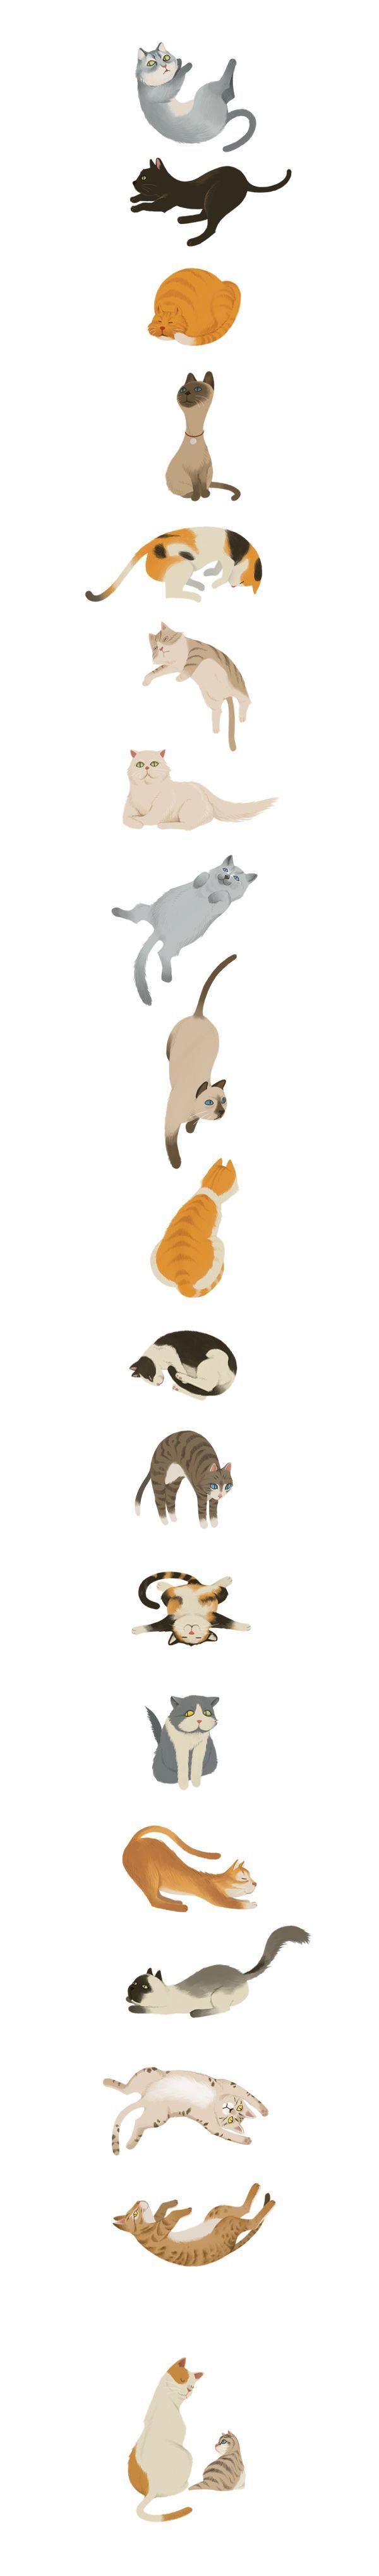 Cats by Wonho Jung, via Behance